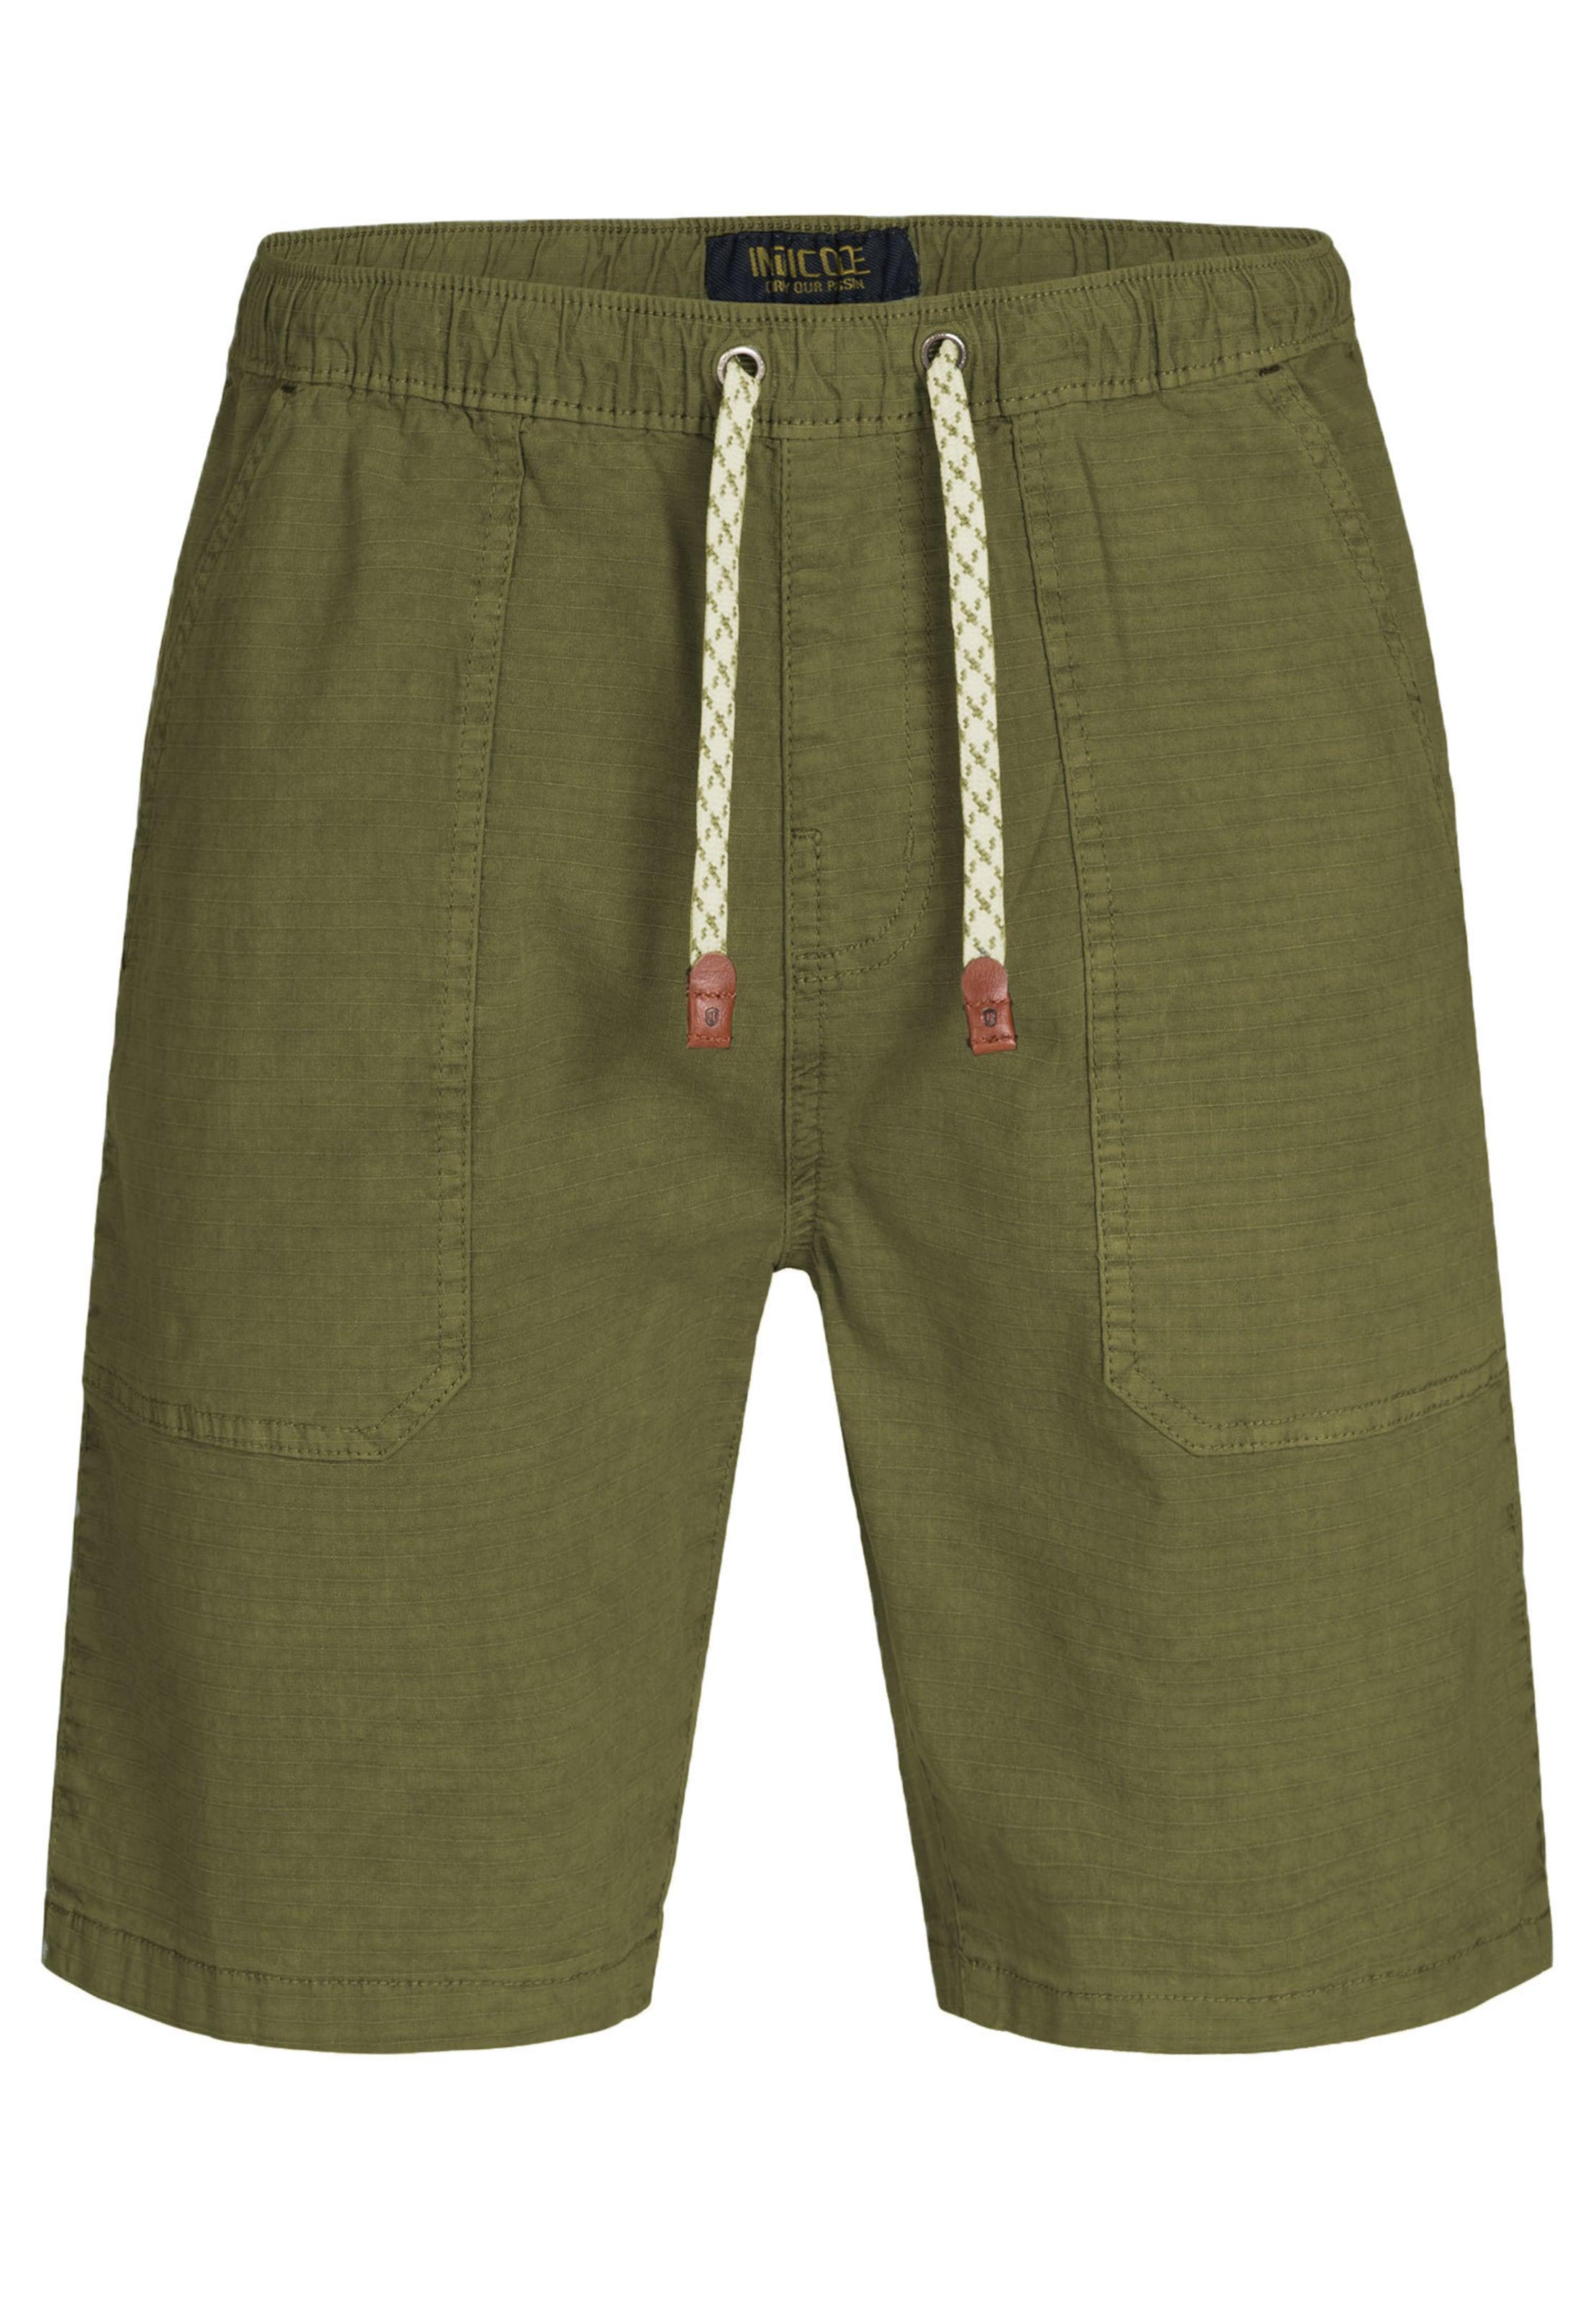 Jeans Khaki In Indicode Shorts 'stoufville' qSMGUVpjLz